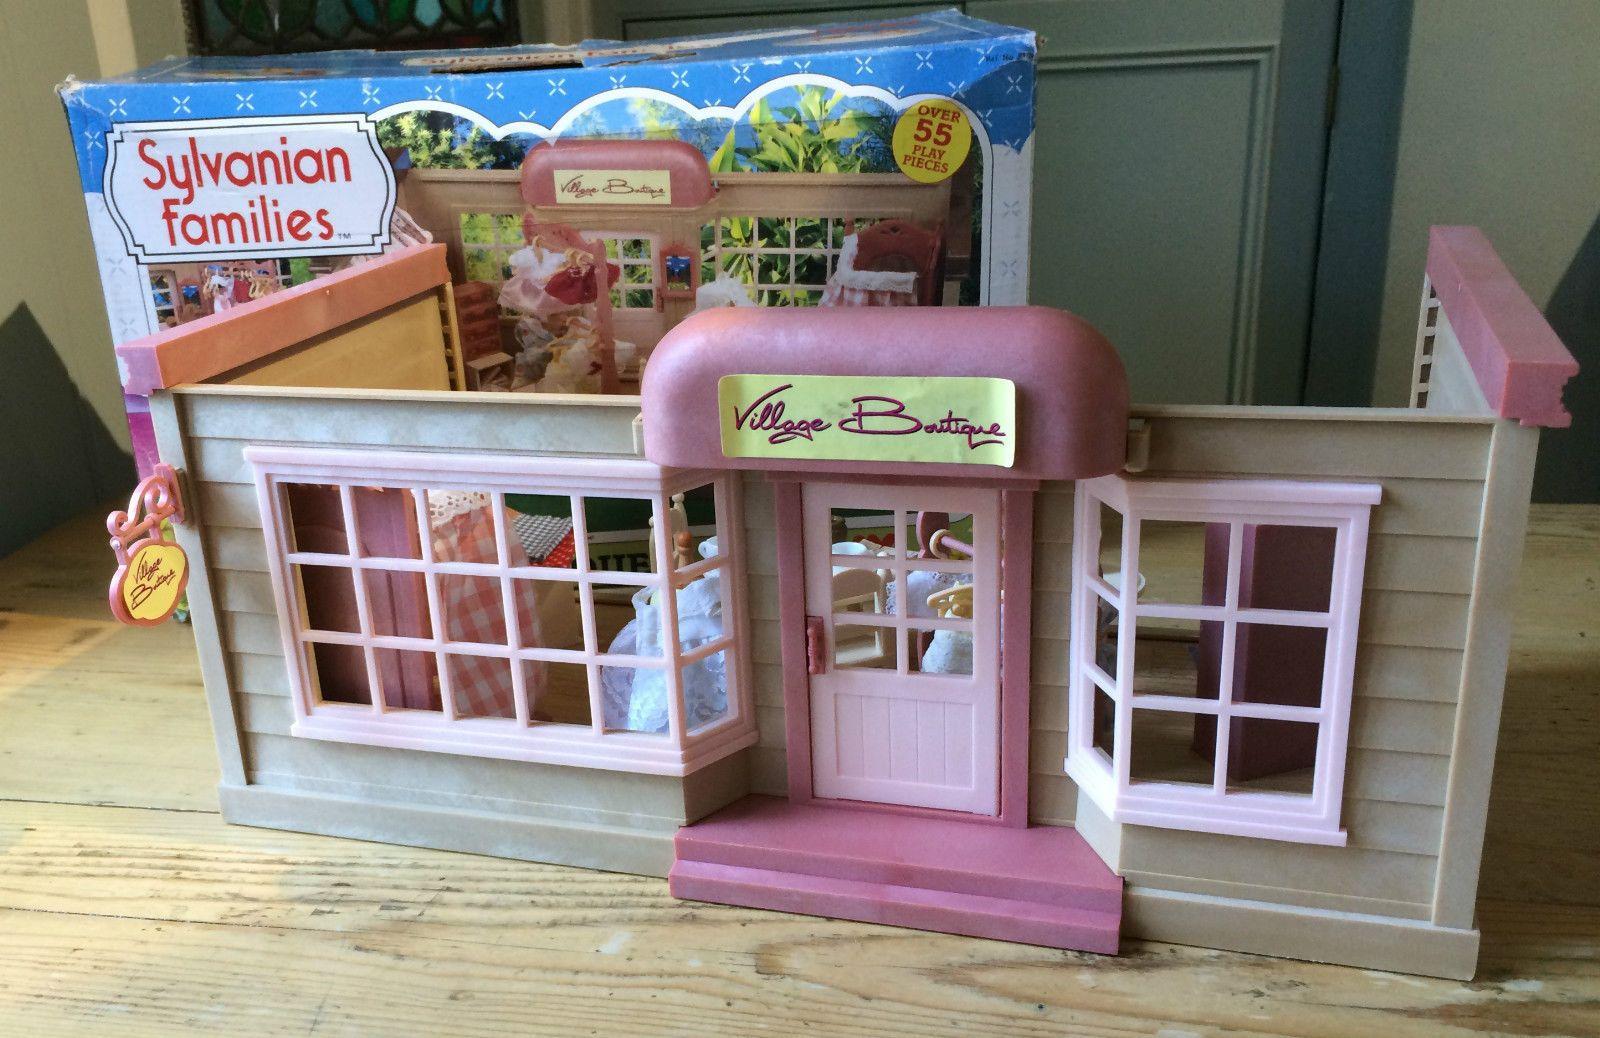 Vintage Tomy Sylvanian Families Village Boutique - boxed